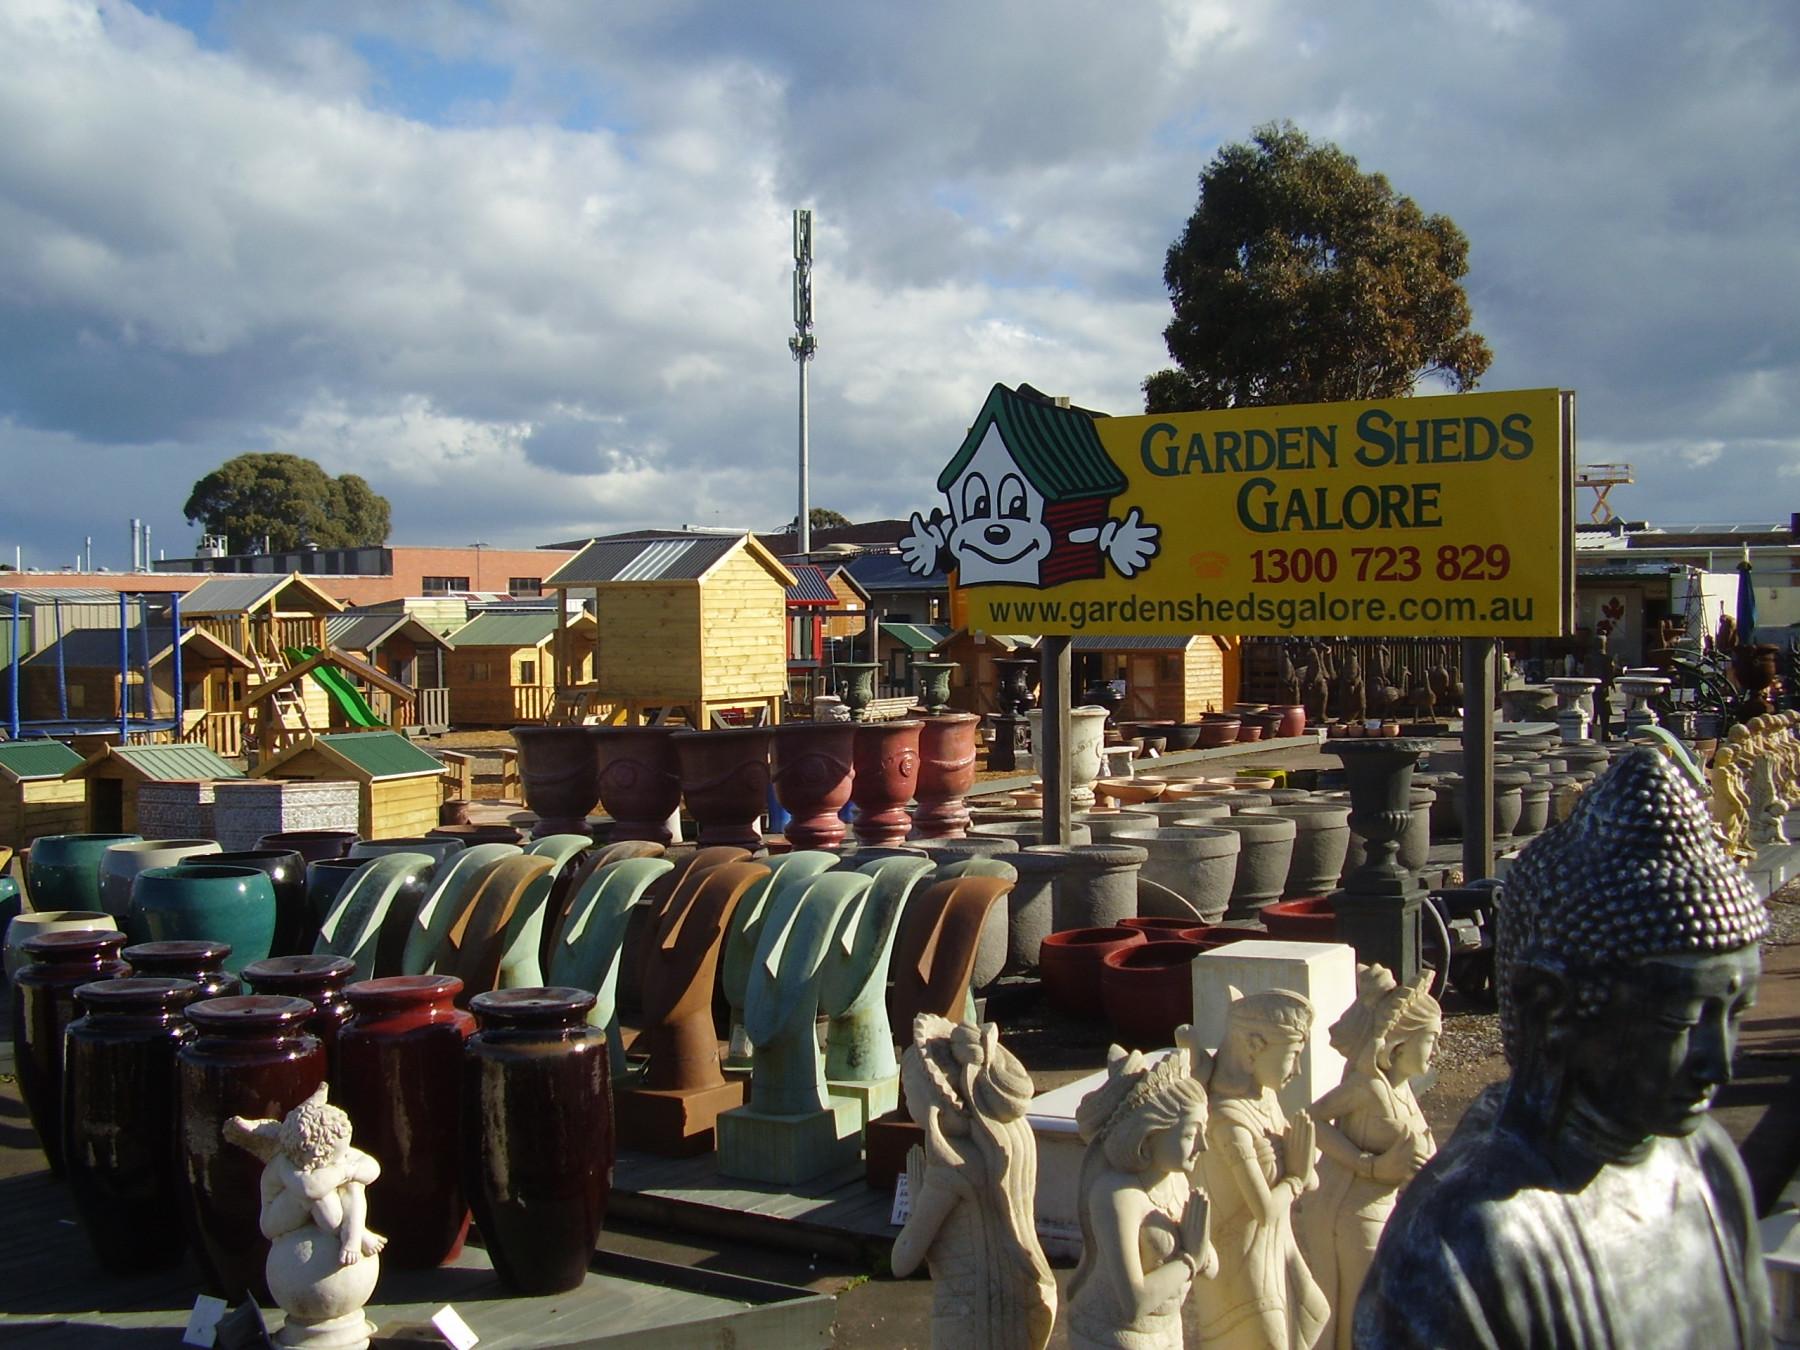 garden shed 225m x 225m storage shed - Garden Sheds Galore